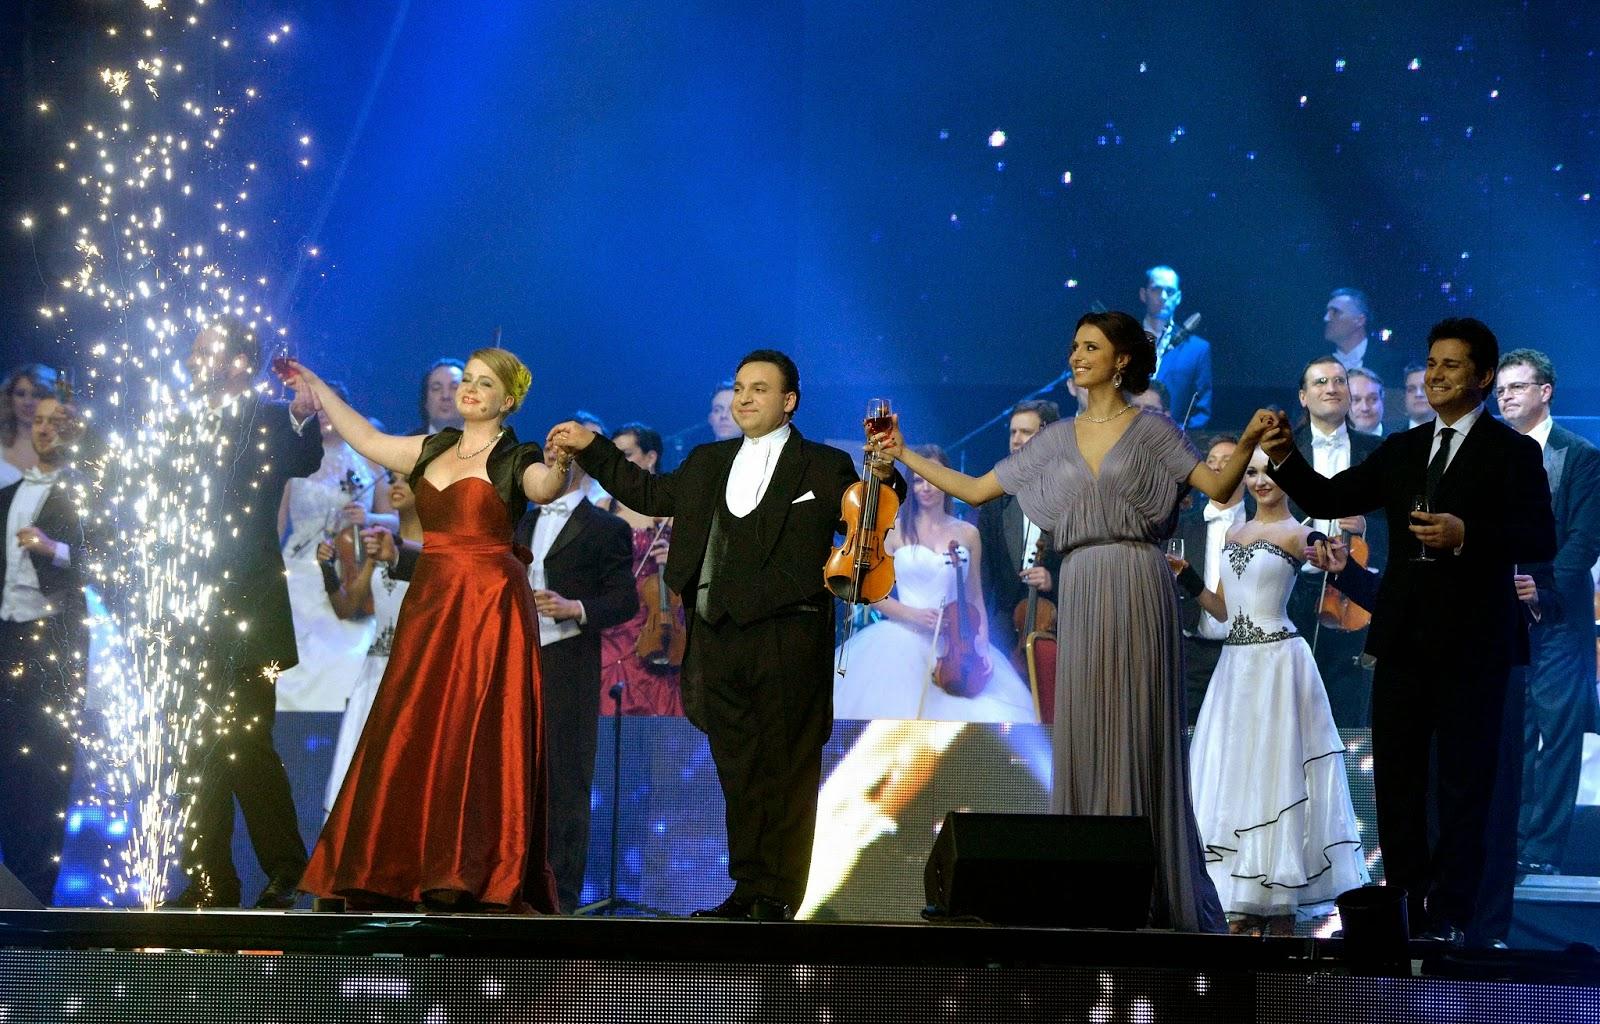 Mága Zoltán, újévi koncert, Budapest, kultúra, zene, tánc, Zakhar Bron, Saimir Pirgu, Valentina Naforniță, Ann Malcolm, Oh Ahmi, Oh Ahmi, Said Tichiti,